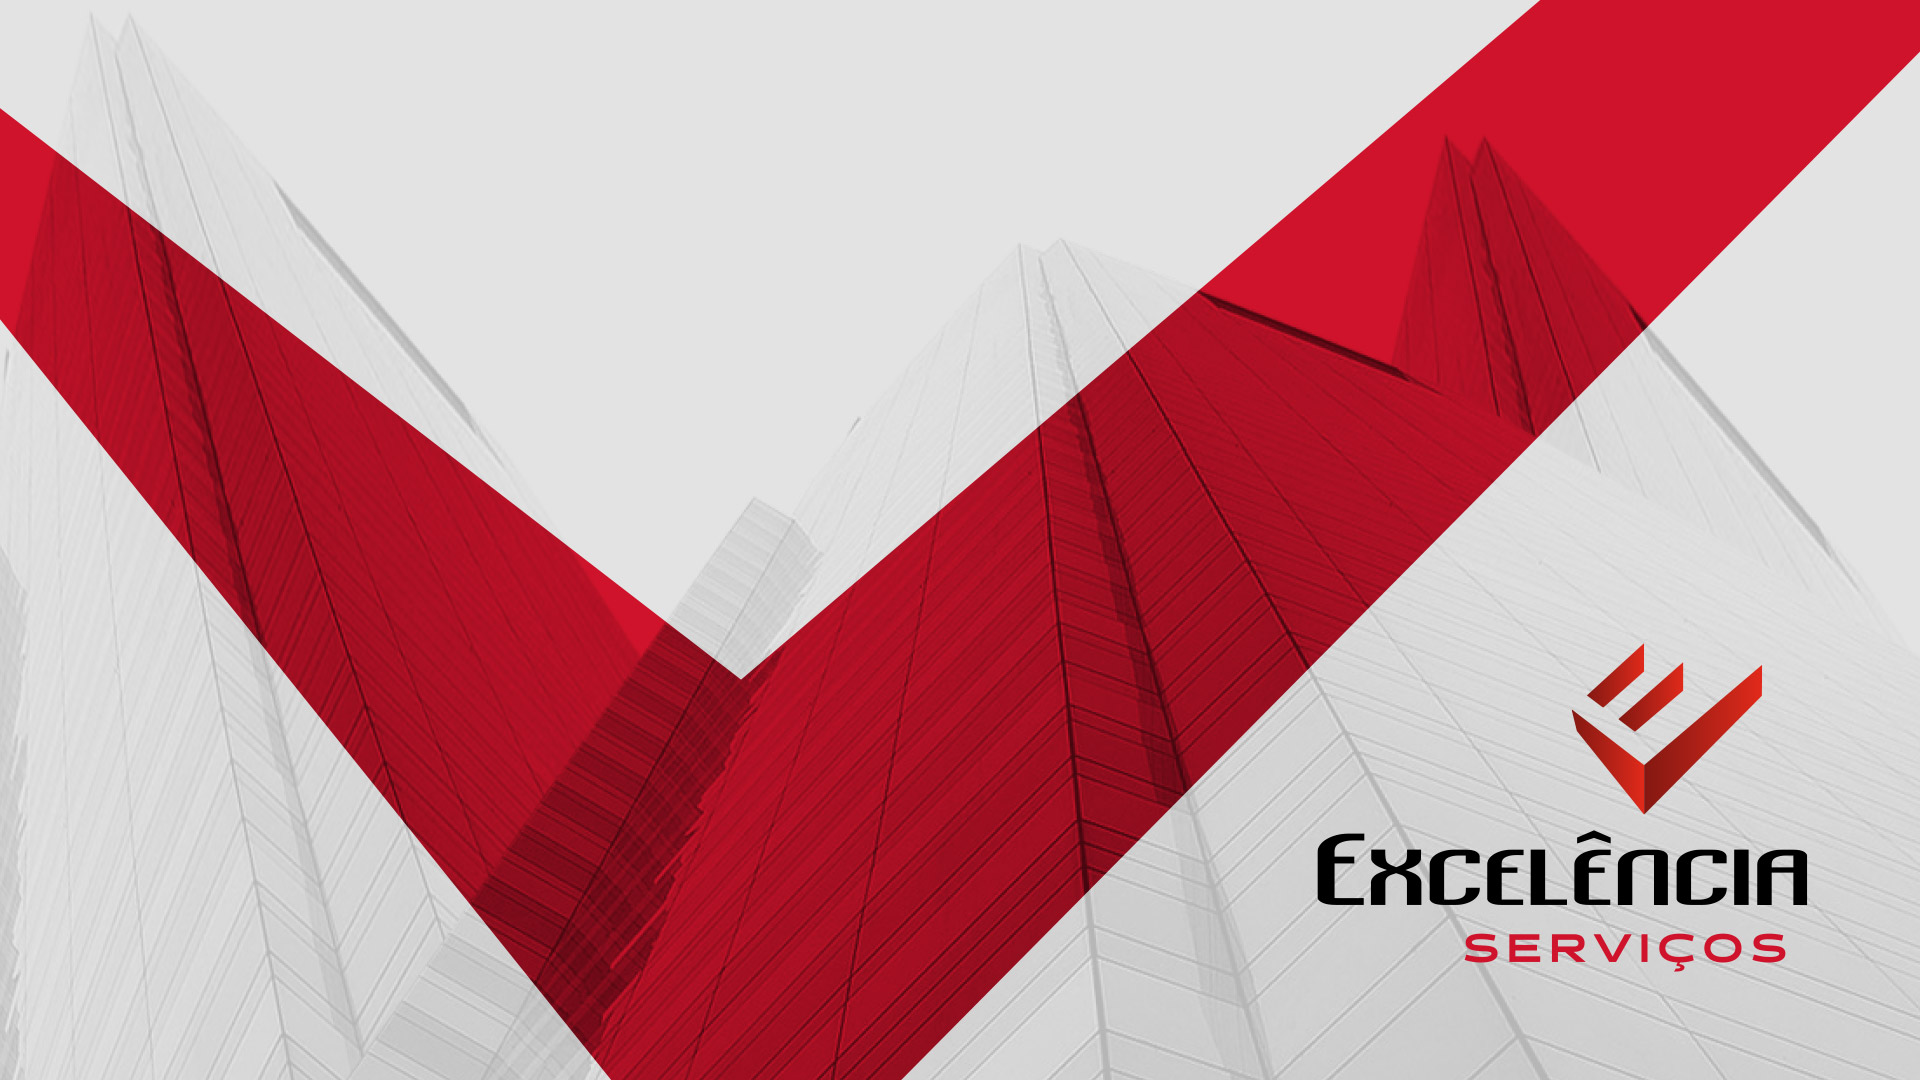 apresentacao-excelencia-01